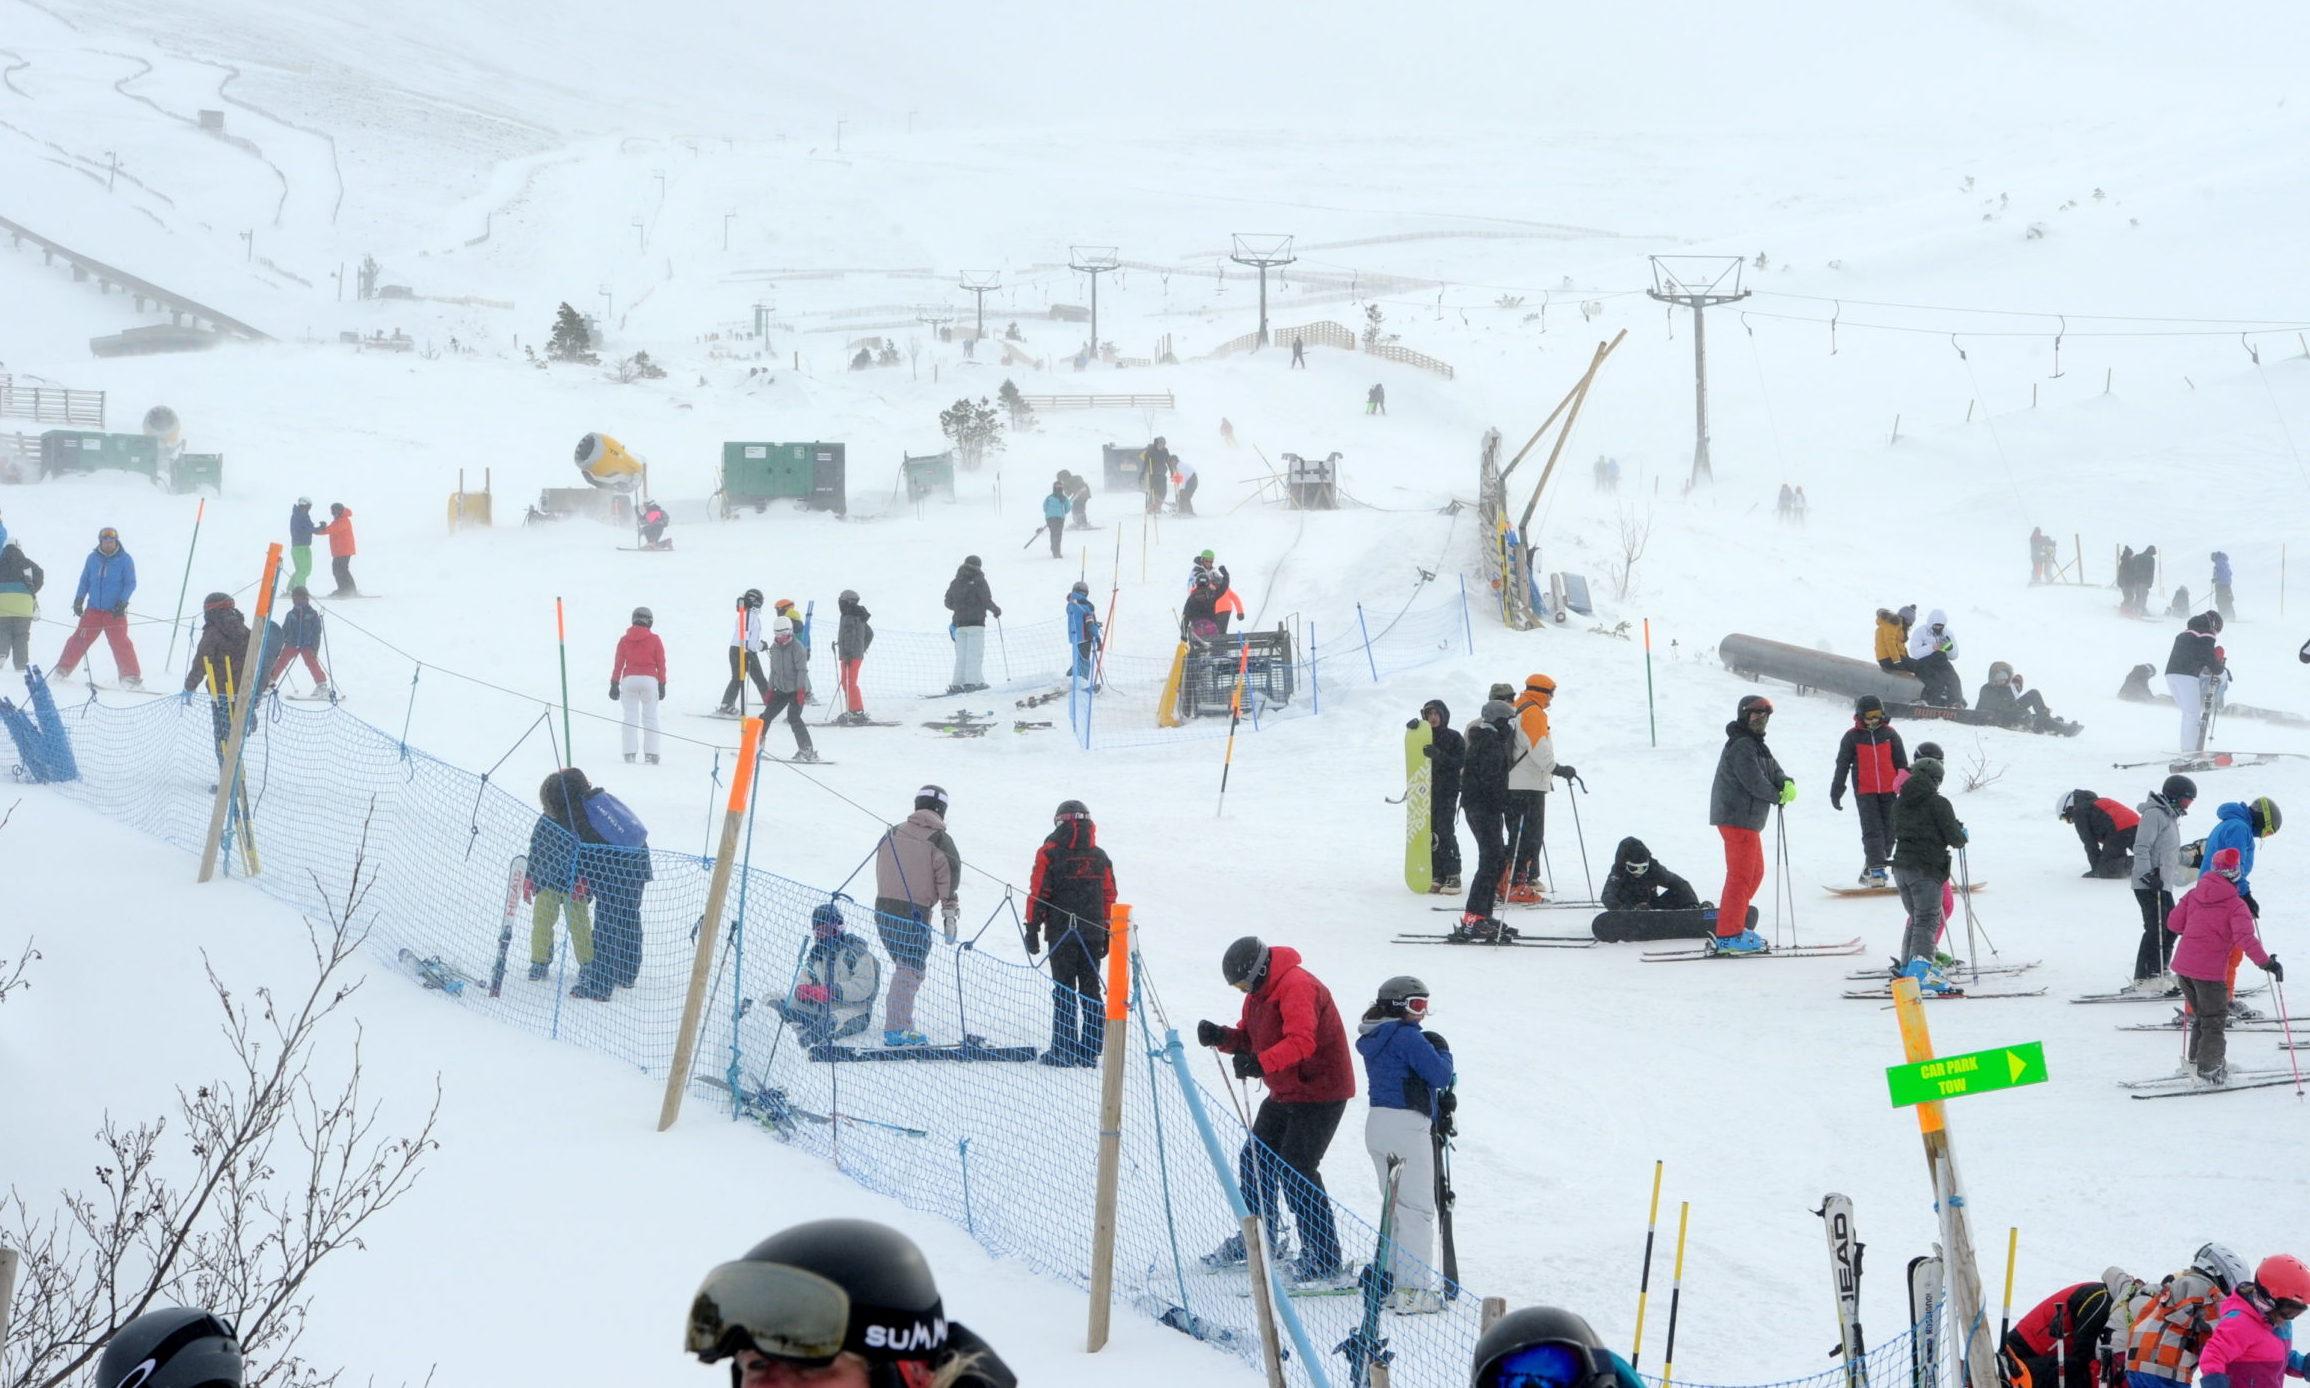 Ski-ing to return to the Cairngorms